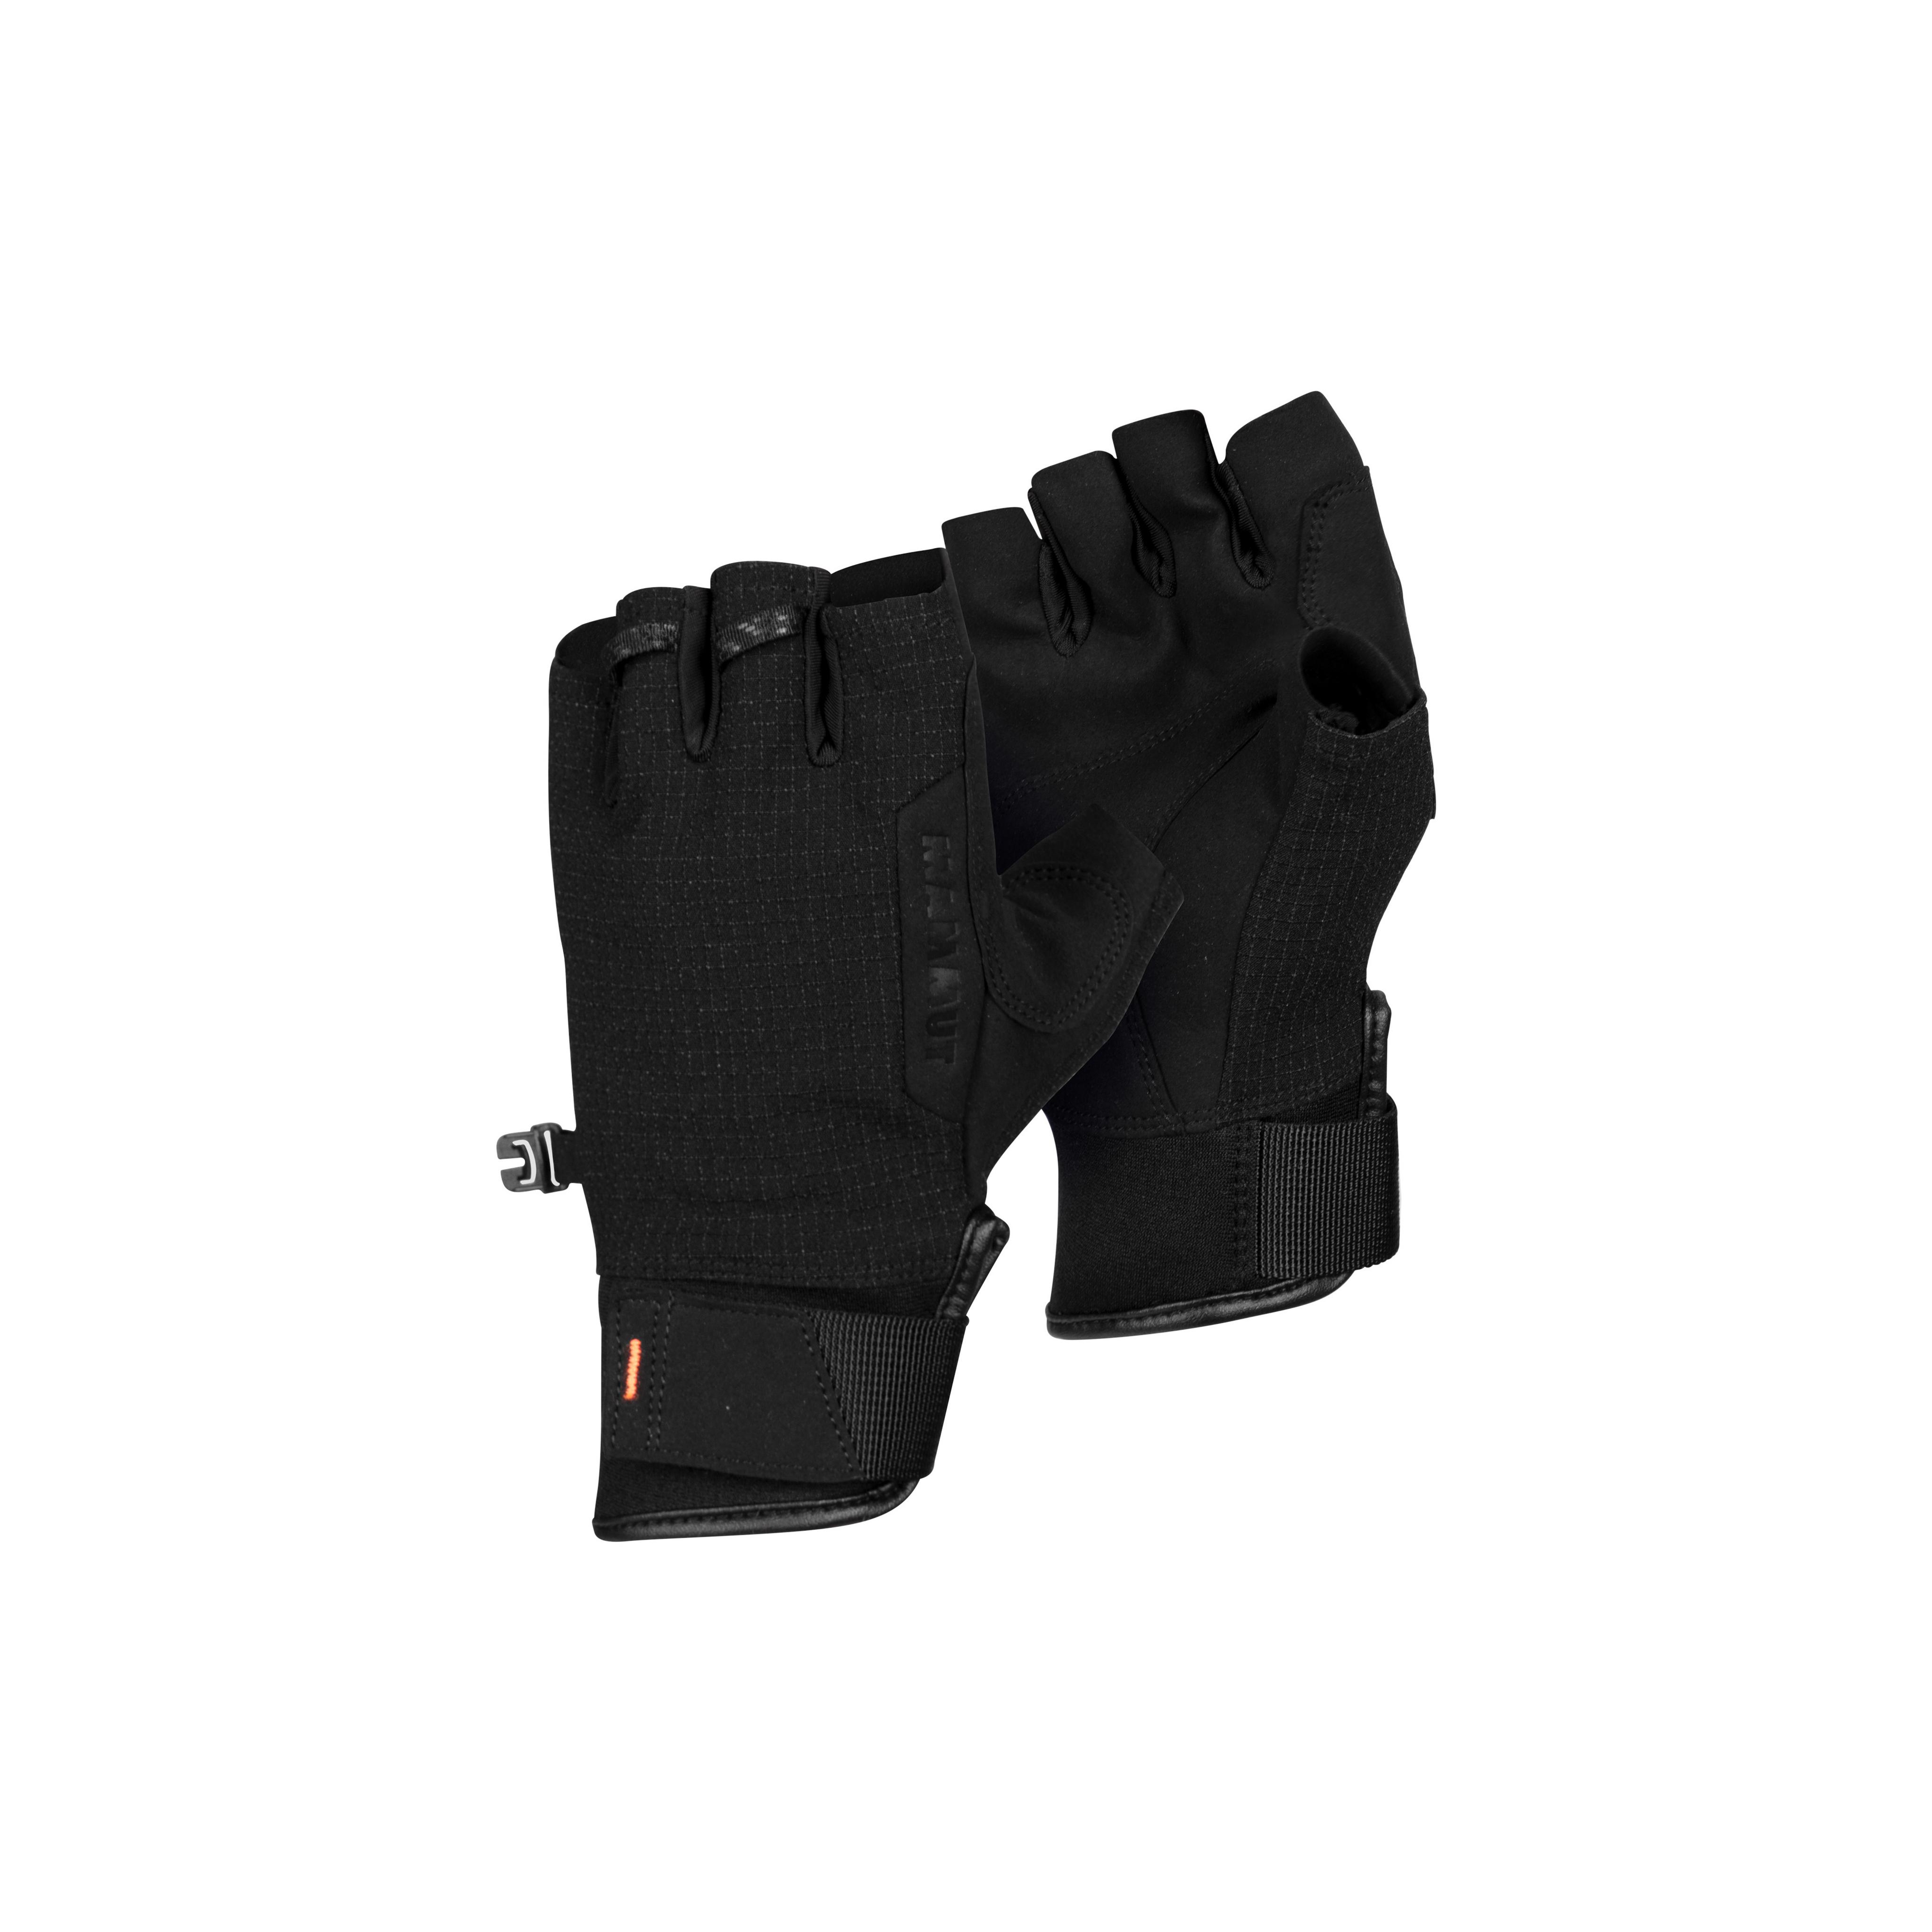 Pordoi Glove - 6, black thumbnail